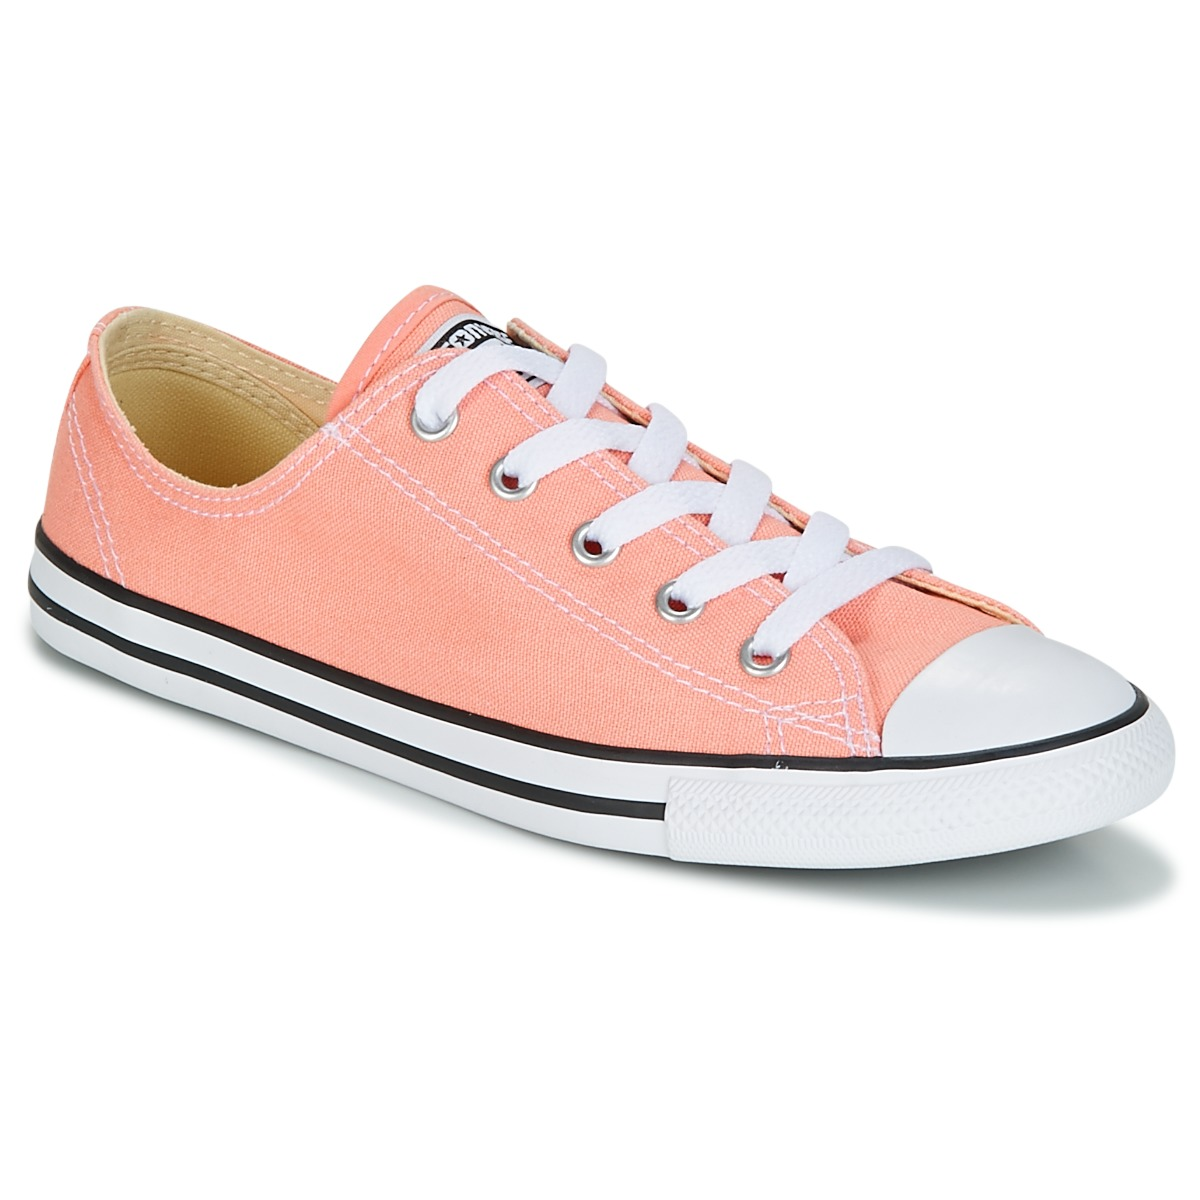 Converse Chuck Taylor All Star Dainty Ox Canvas Color Rose - Kostenloser  Versand bei Spartoo.de ! - Schuhe Sneaker Low Damen 63,95 €